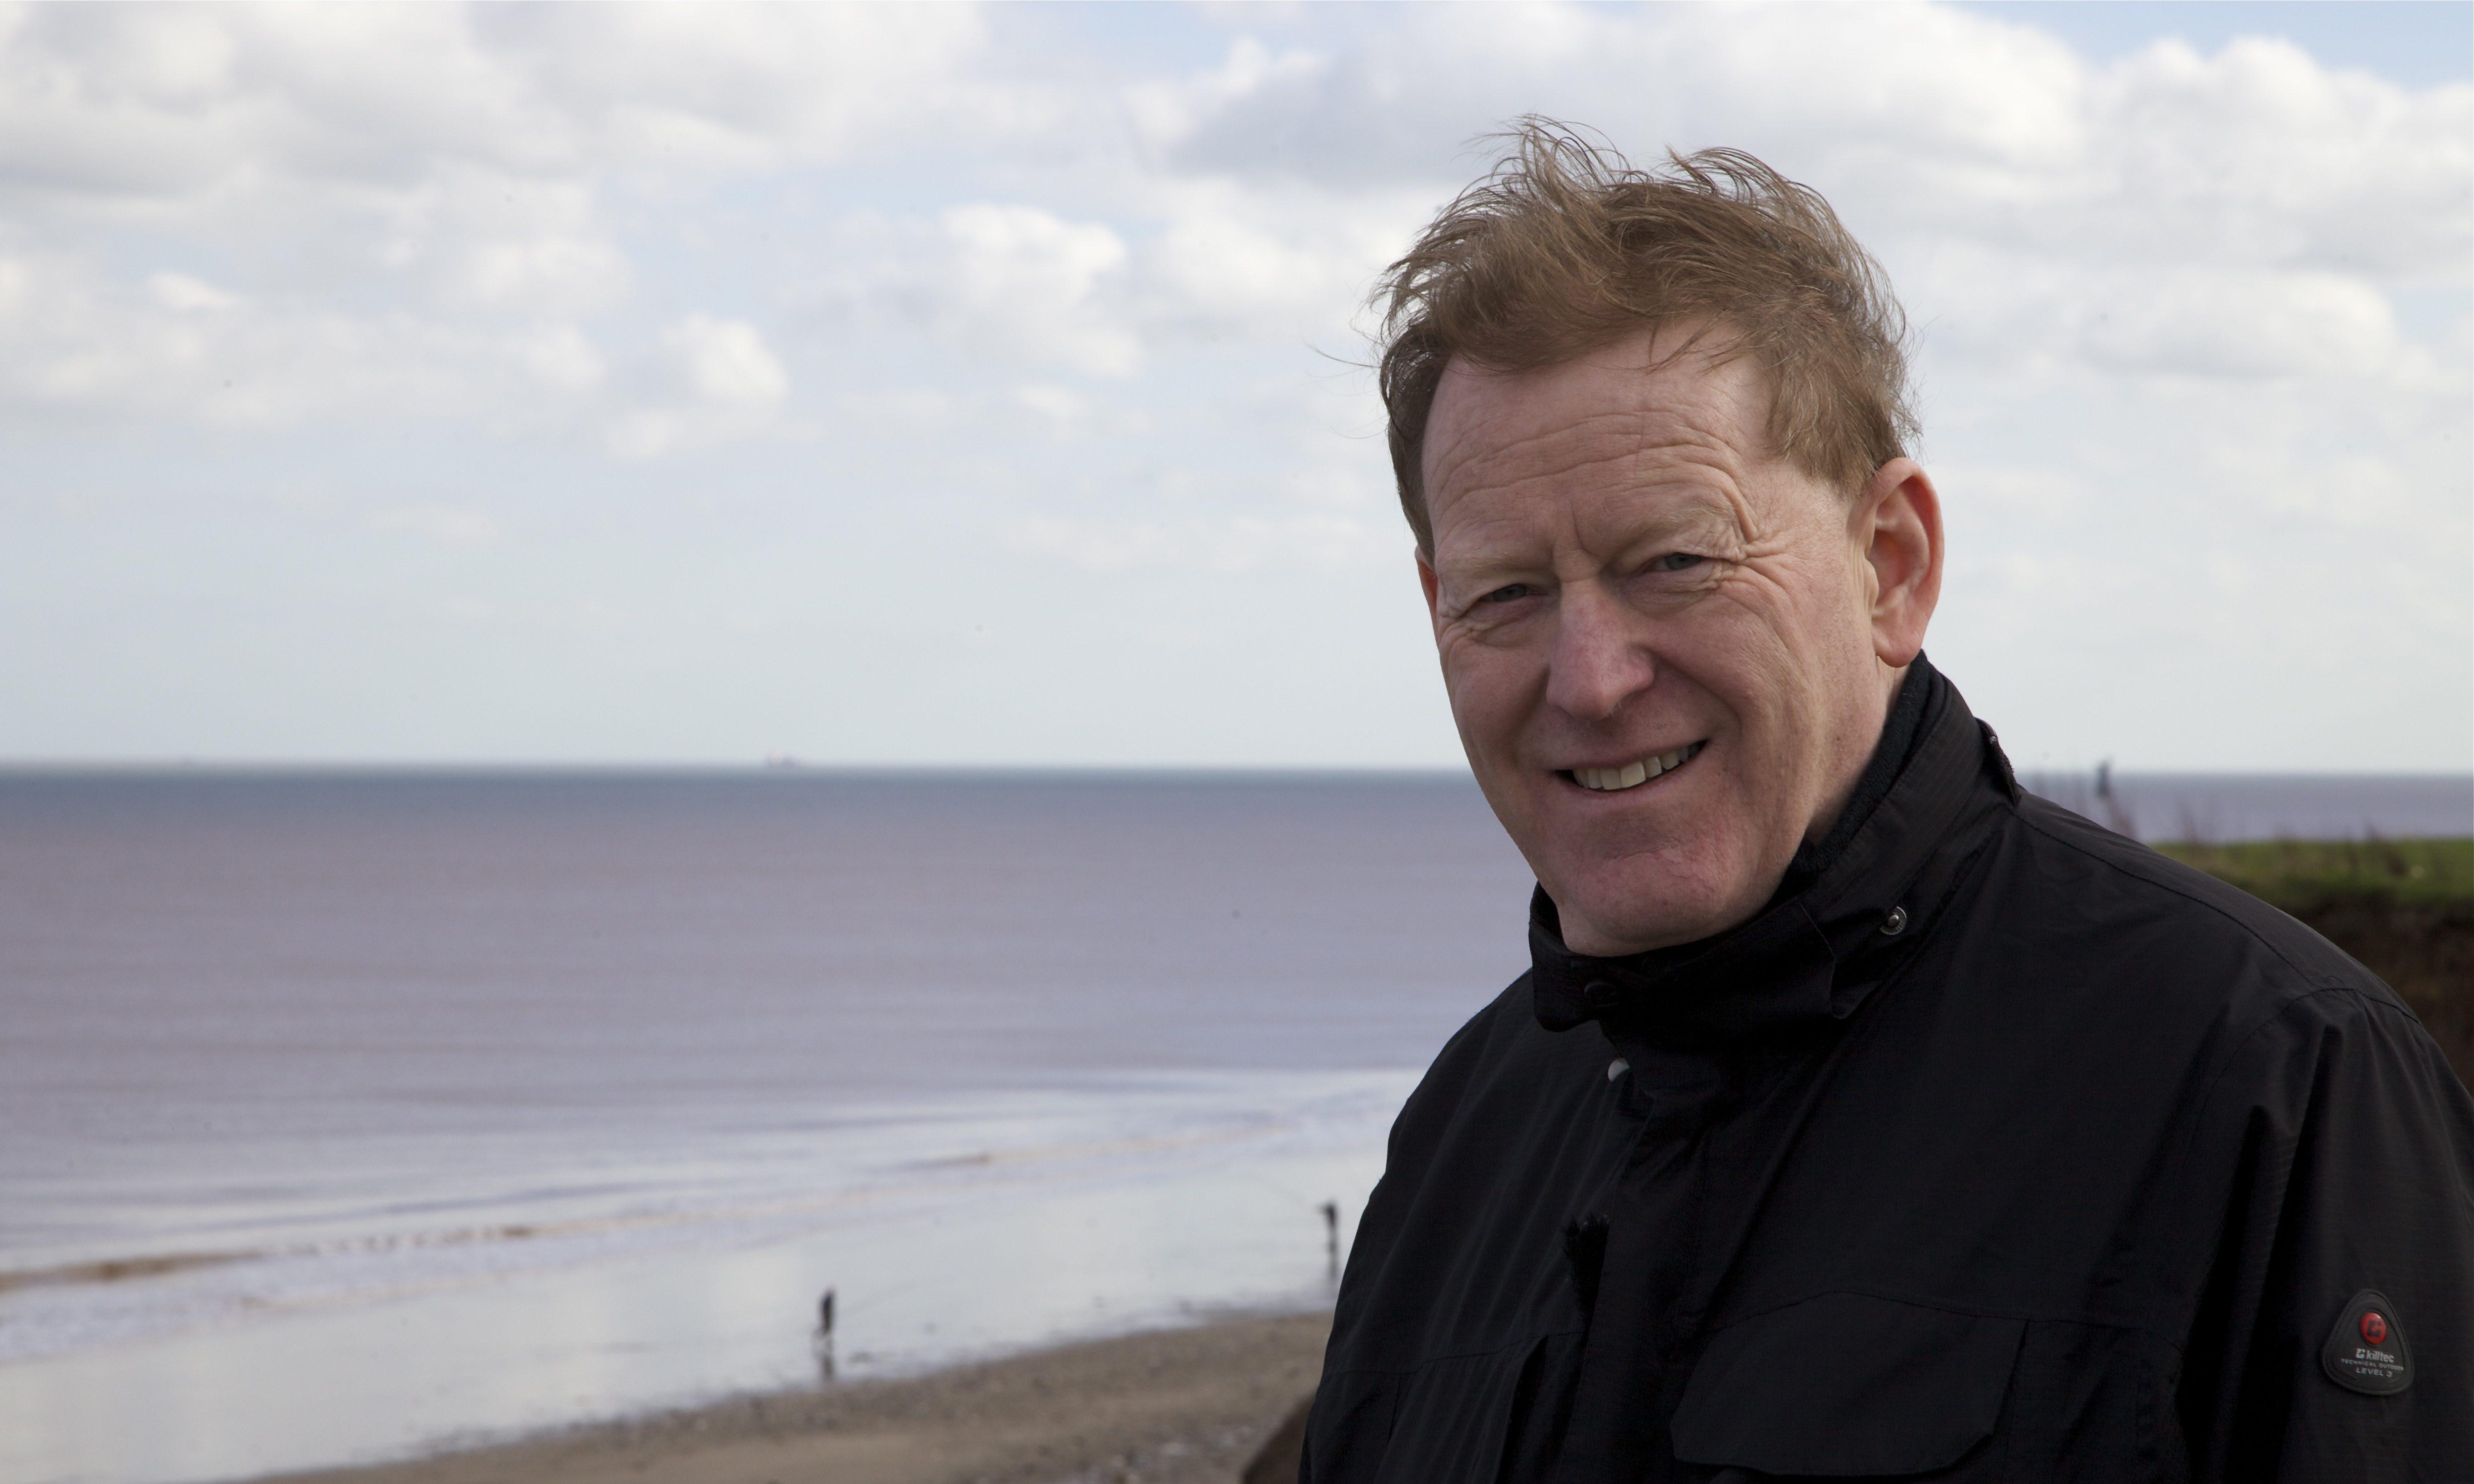 Professor Rob Duck, Emeritus Professor of Environmental Geoscience at Dundee University.